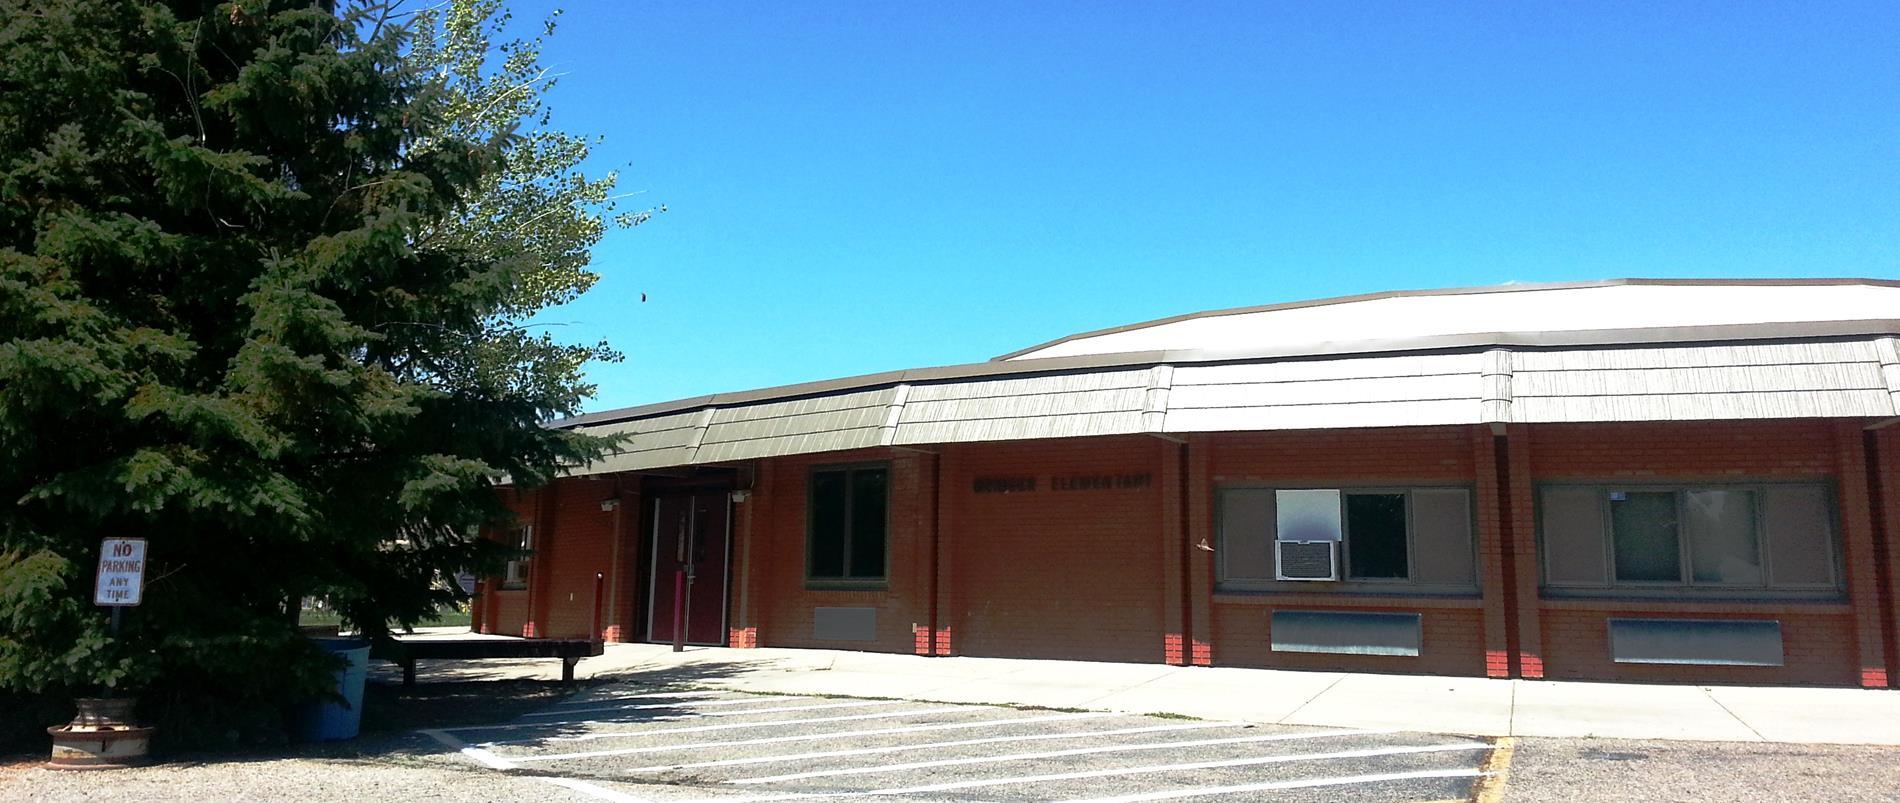 Bridger Elementary School